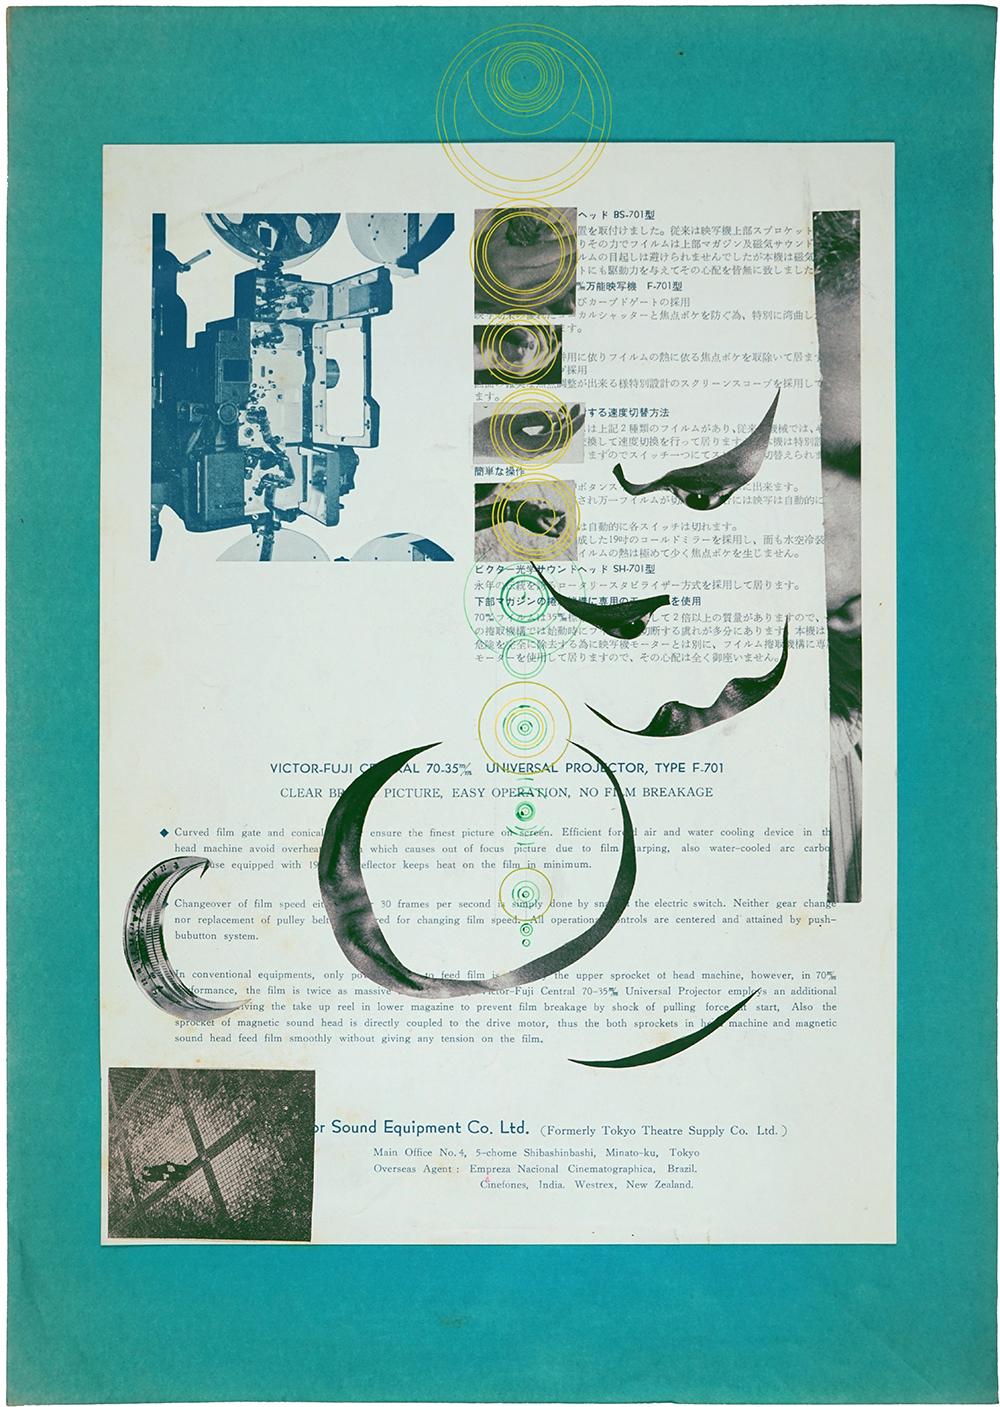 aka-collage-2_圧縮